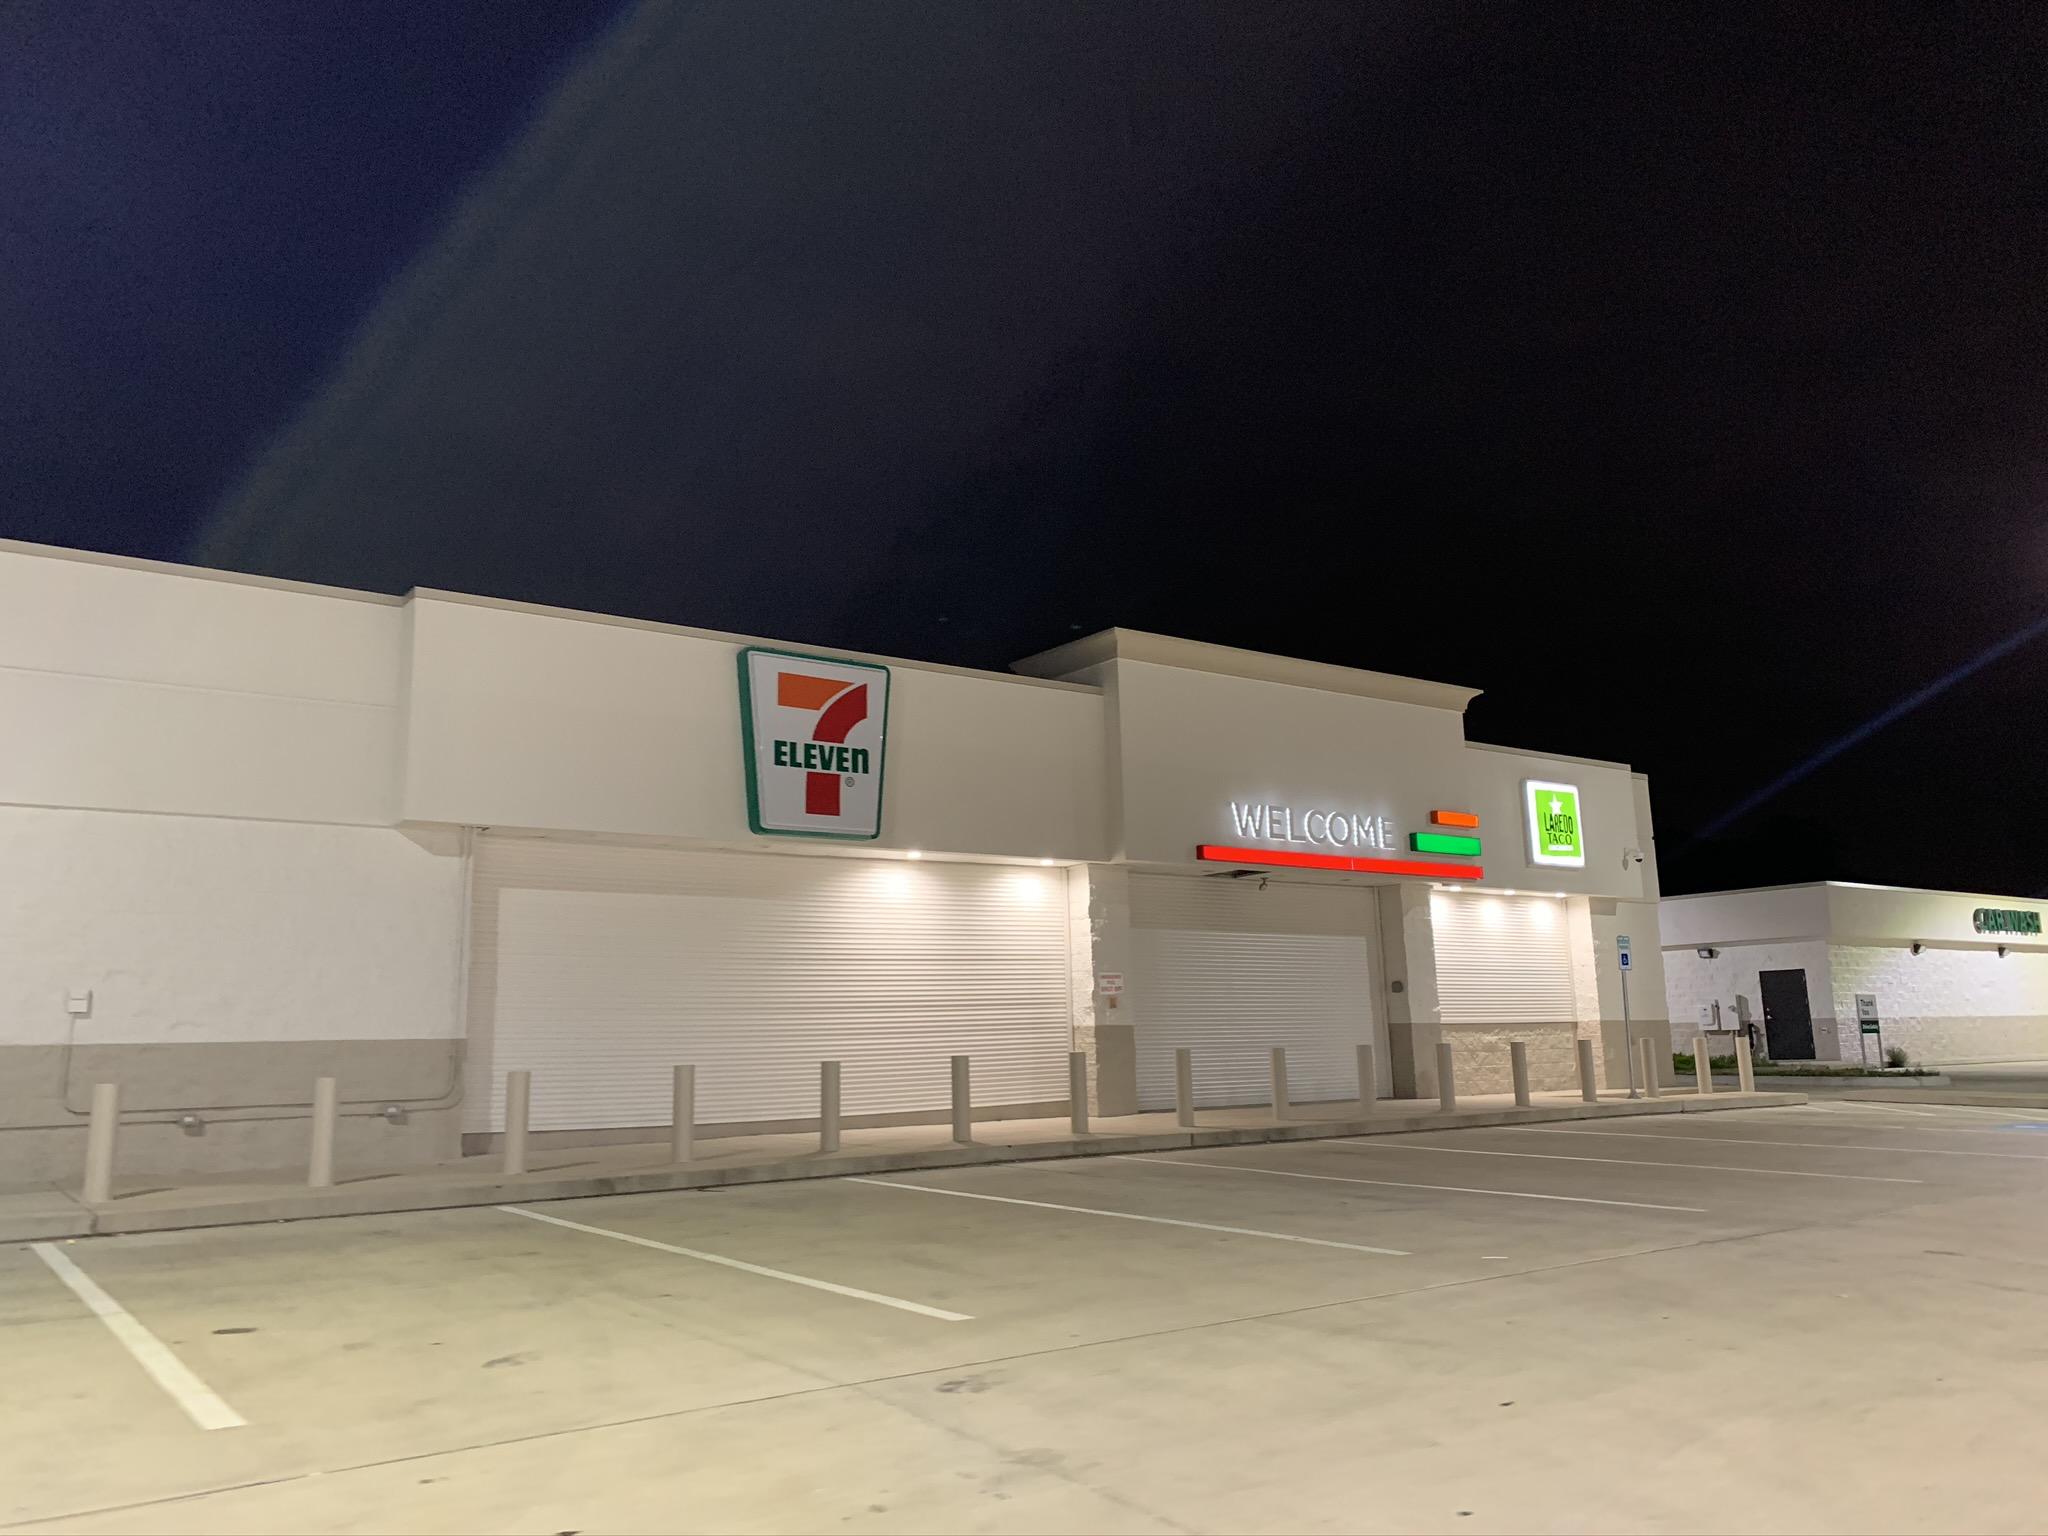 7-Eleven's less than triumphant Houston return